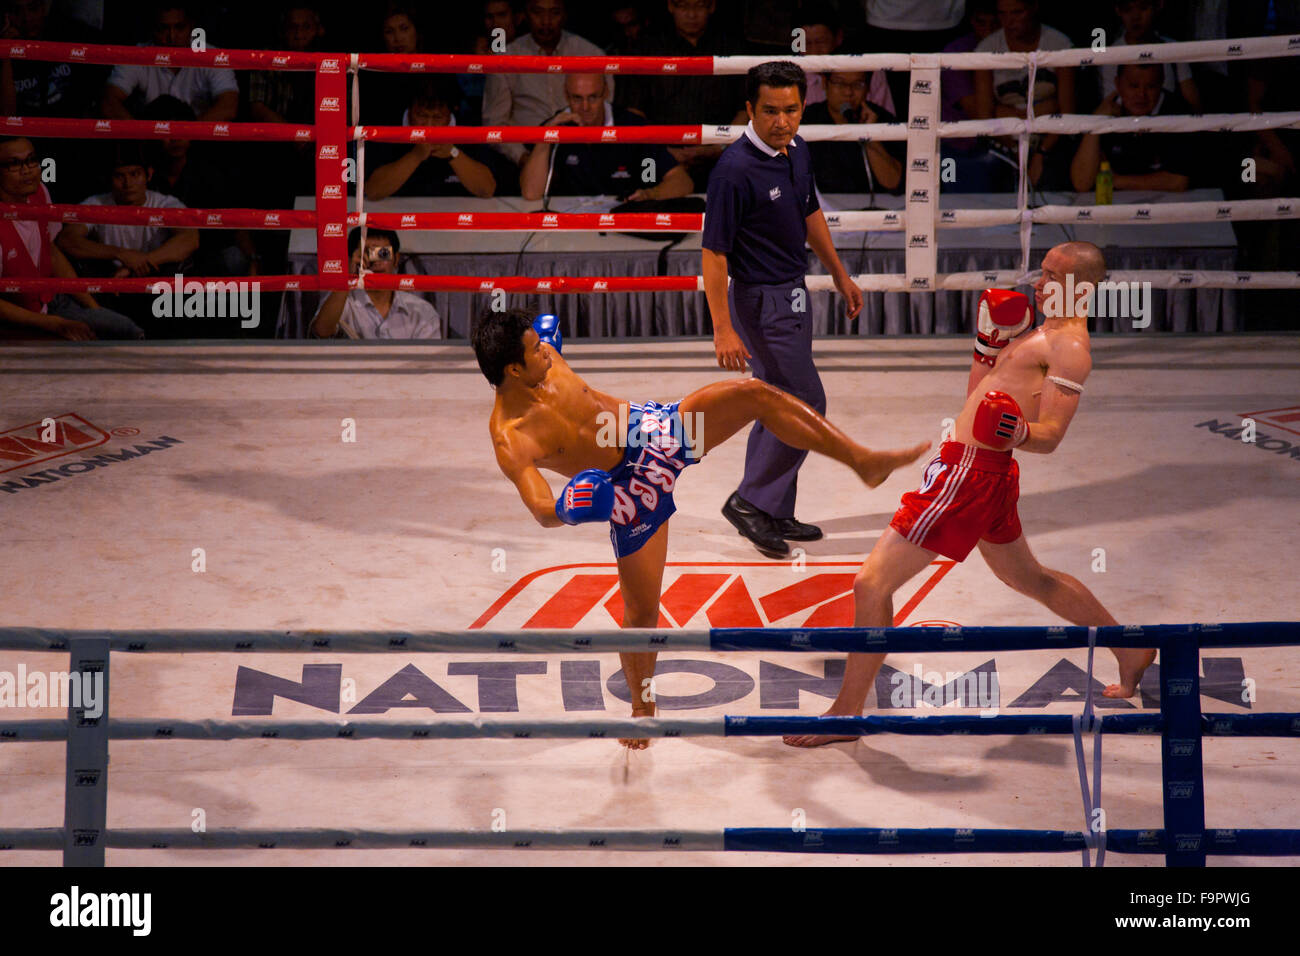 Caucasian man muay thai kickboxer dodging kick from Thai opponent at amateur night outdoor match - Stock Image